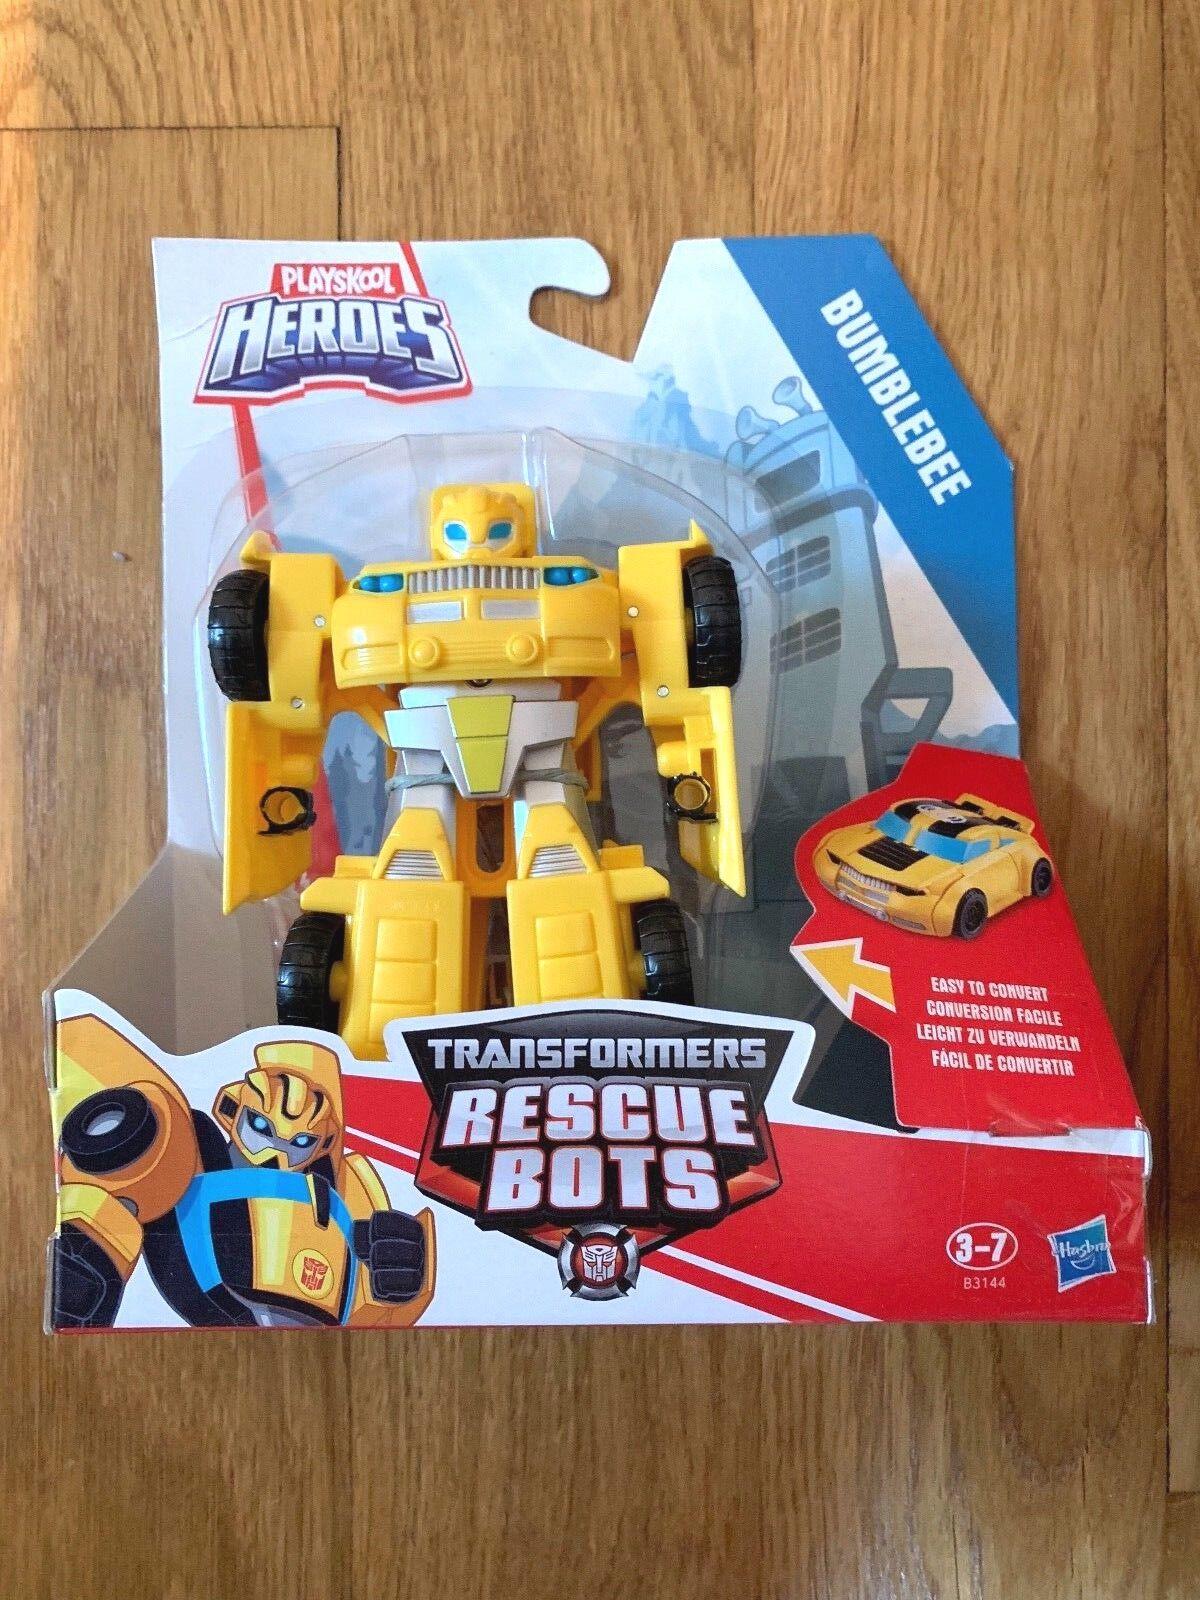 Playskool heroes transformer rescue bots Bumblebee Bumblebee Bumblebee CAR 28ec39